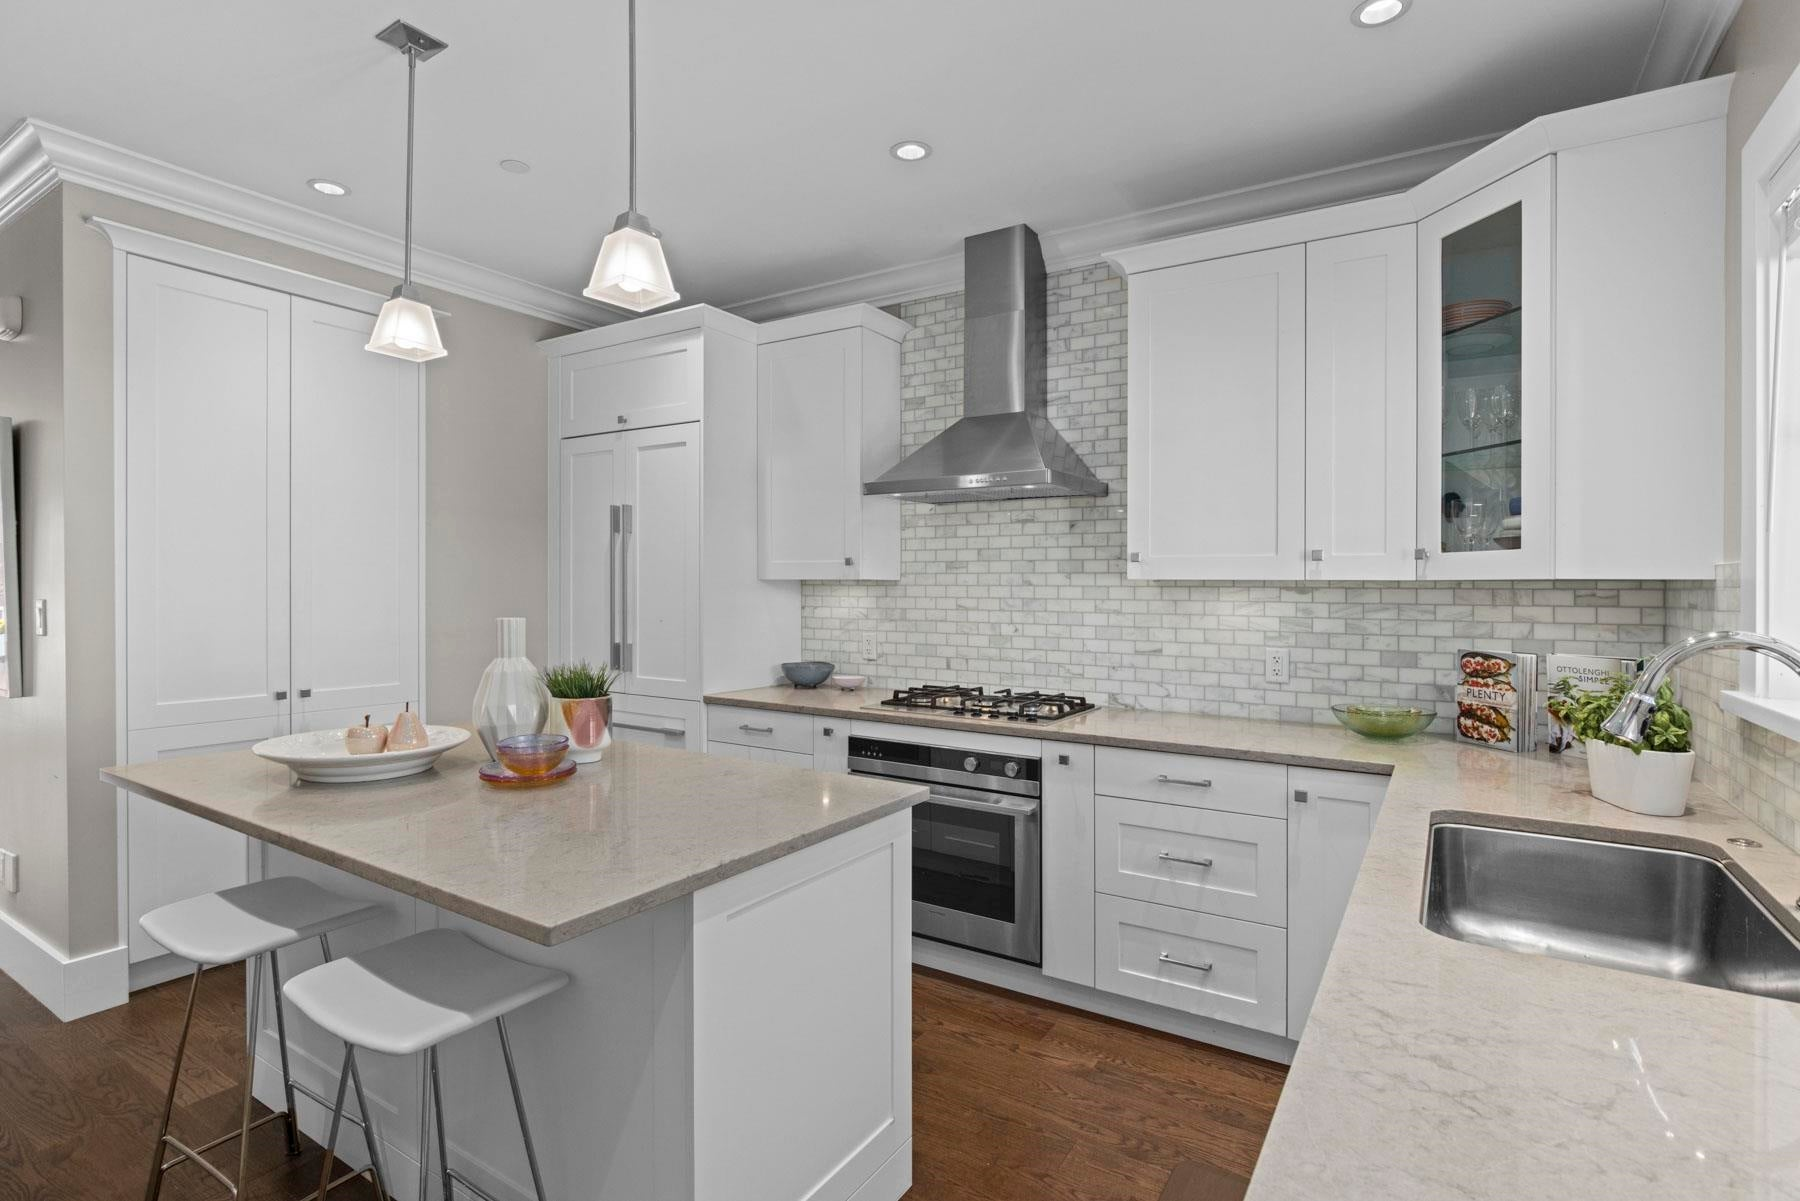 1421 GORDON AVENUE - Ambleside House/Single Family for sale, 3 Bedrooms (R2617756) - #10